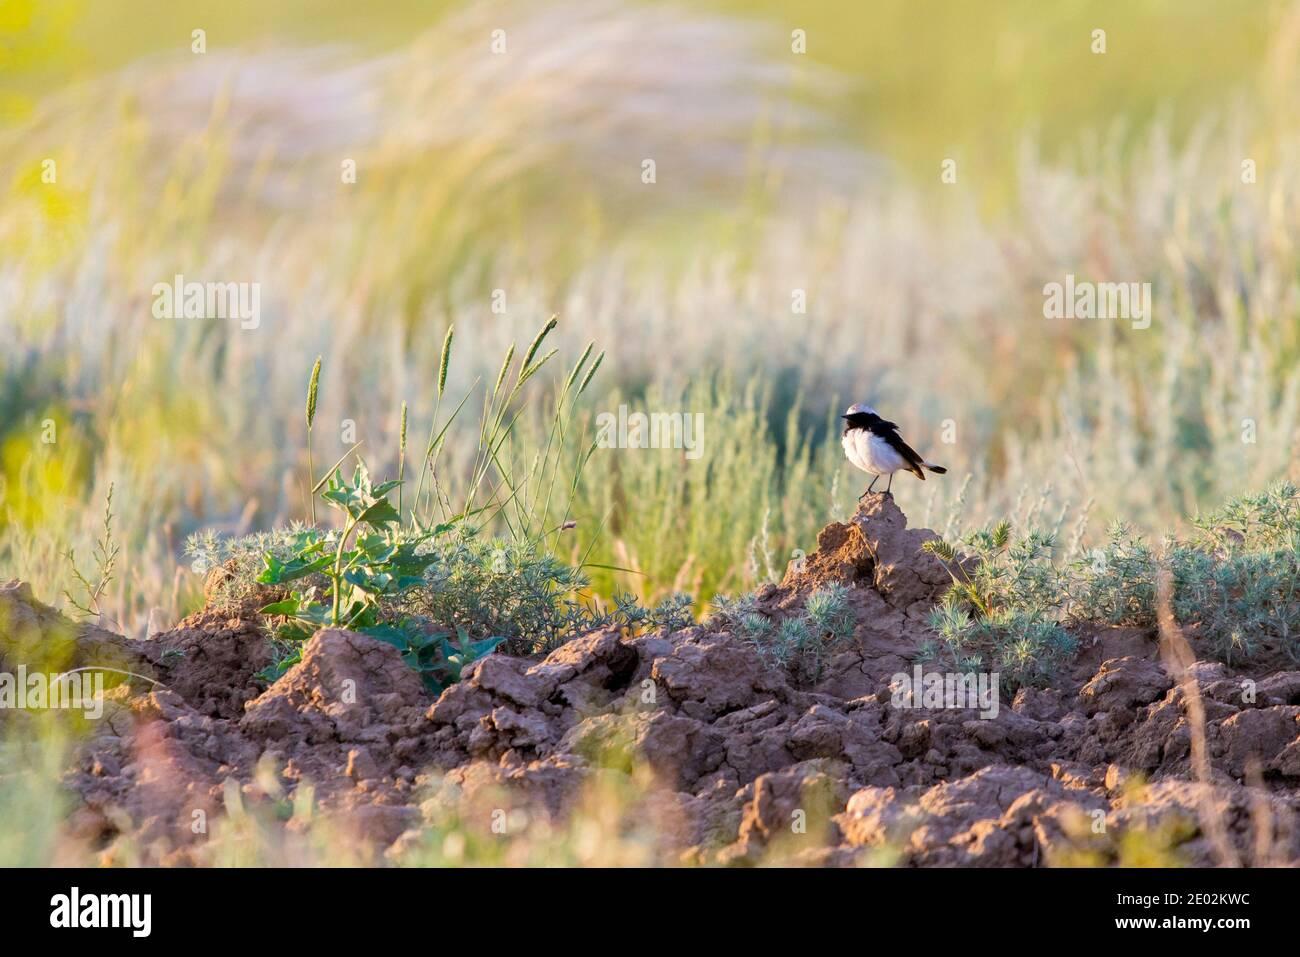 Pied wheatear or Oenanthe pleschanka in natural habitat. Stock Photo